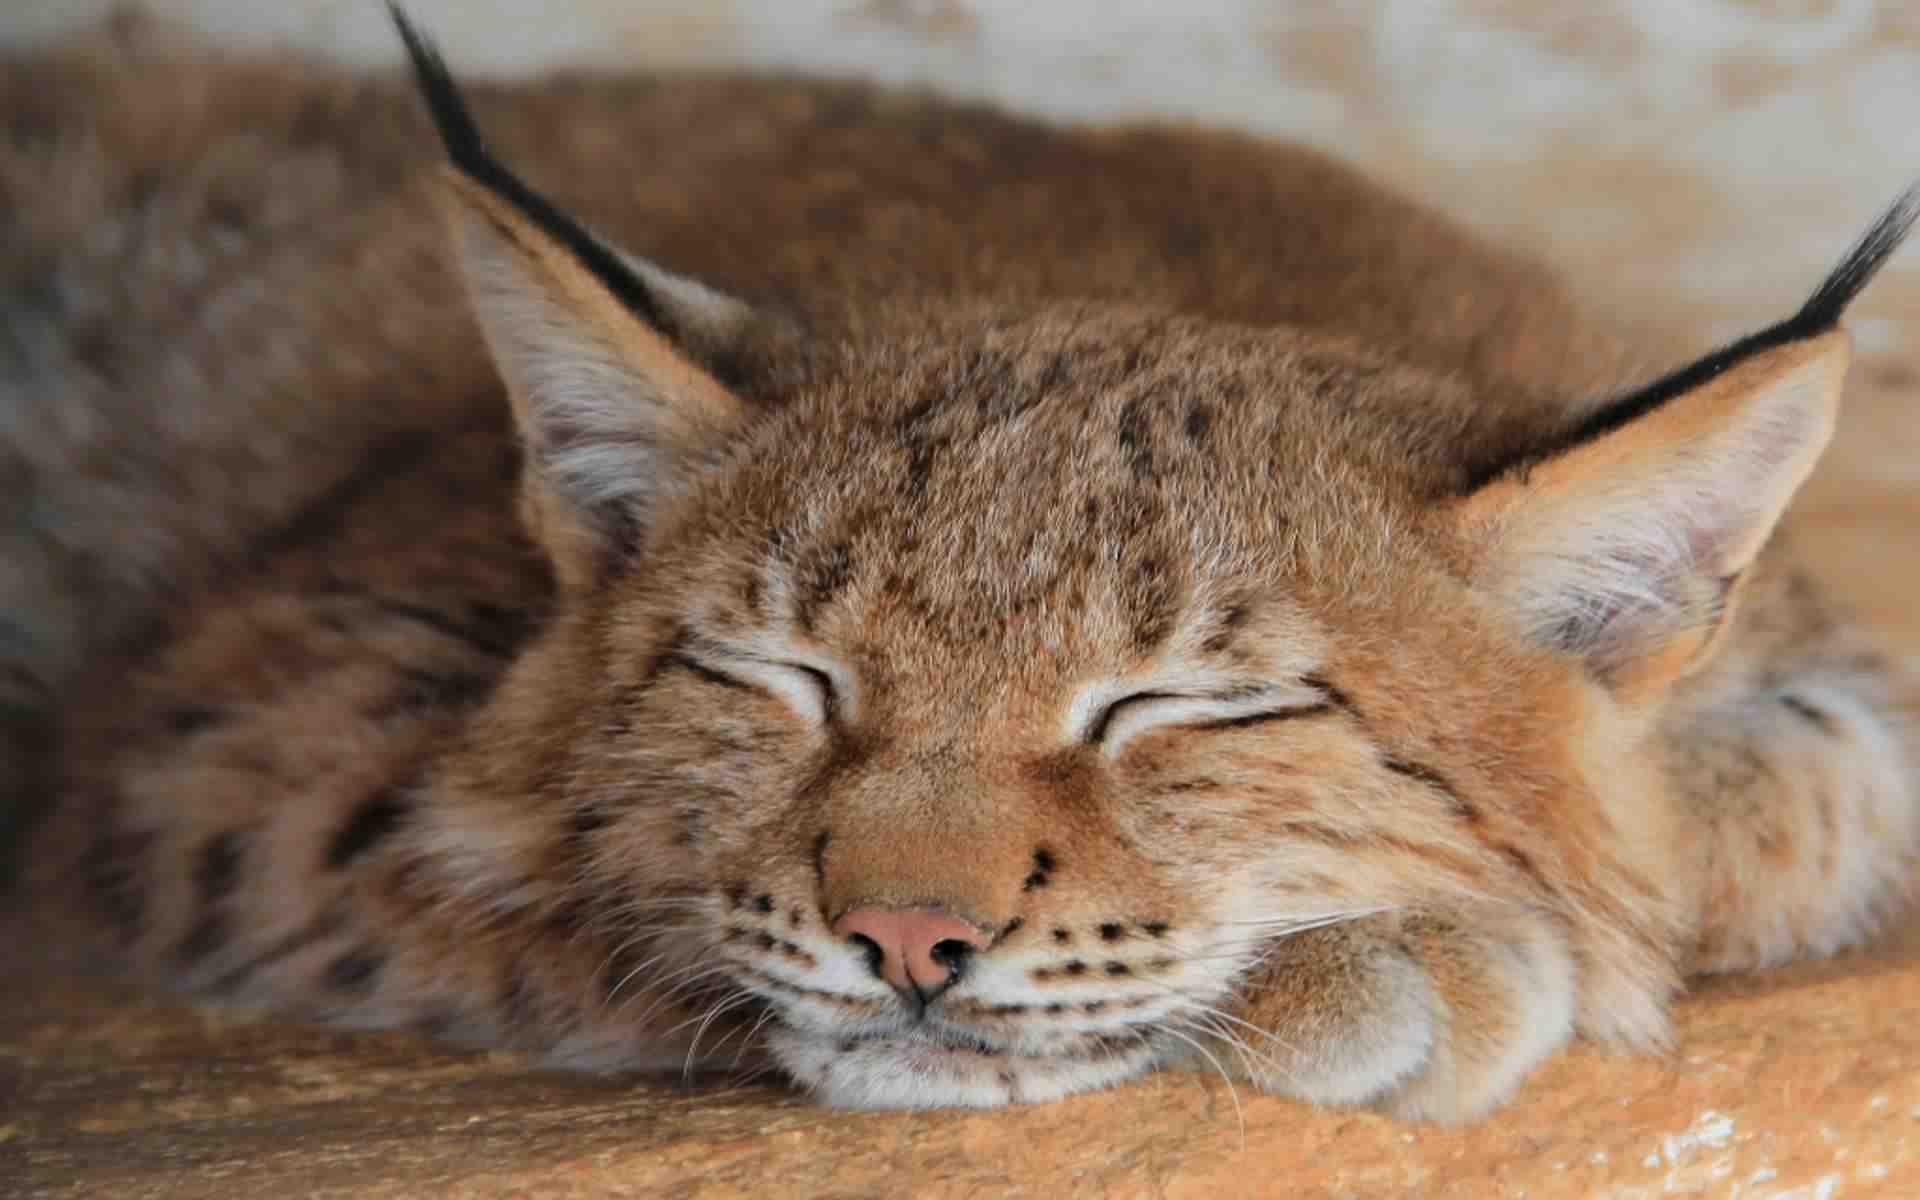 DOWNLOAD: lynx sleep predator face big cat free picture 2560 x 1600